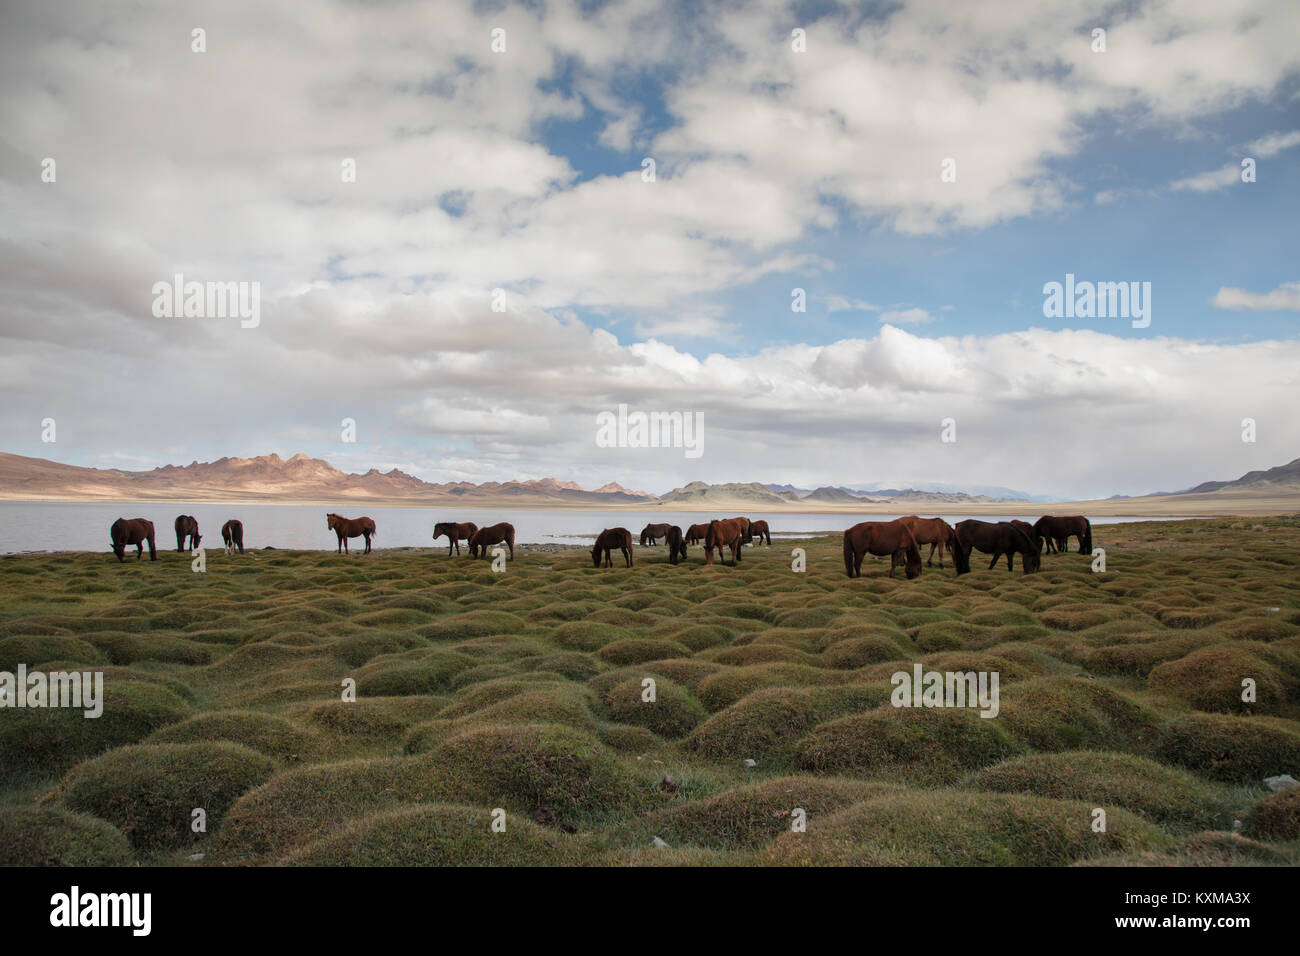 Mongolia lake horses grazing grass - Stock Image